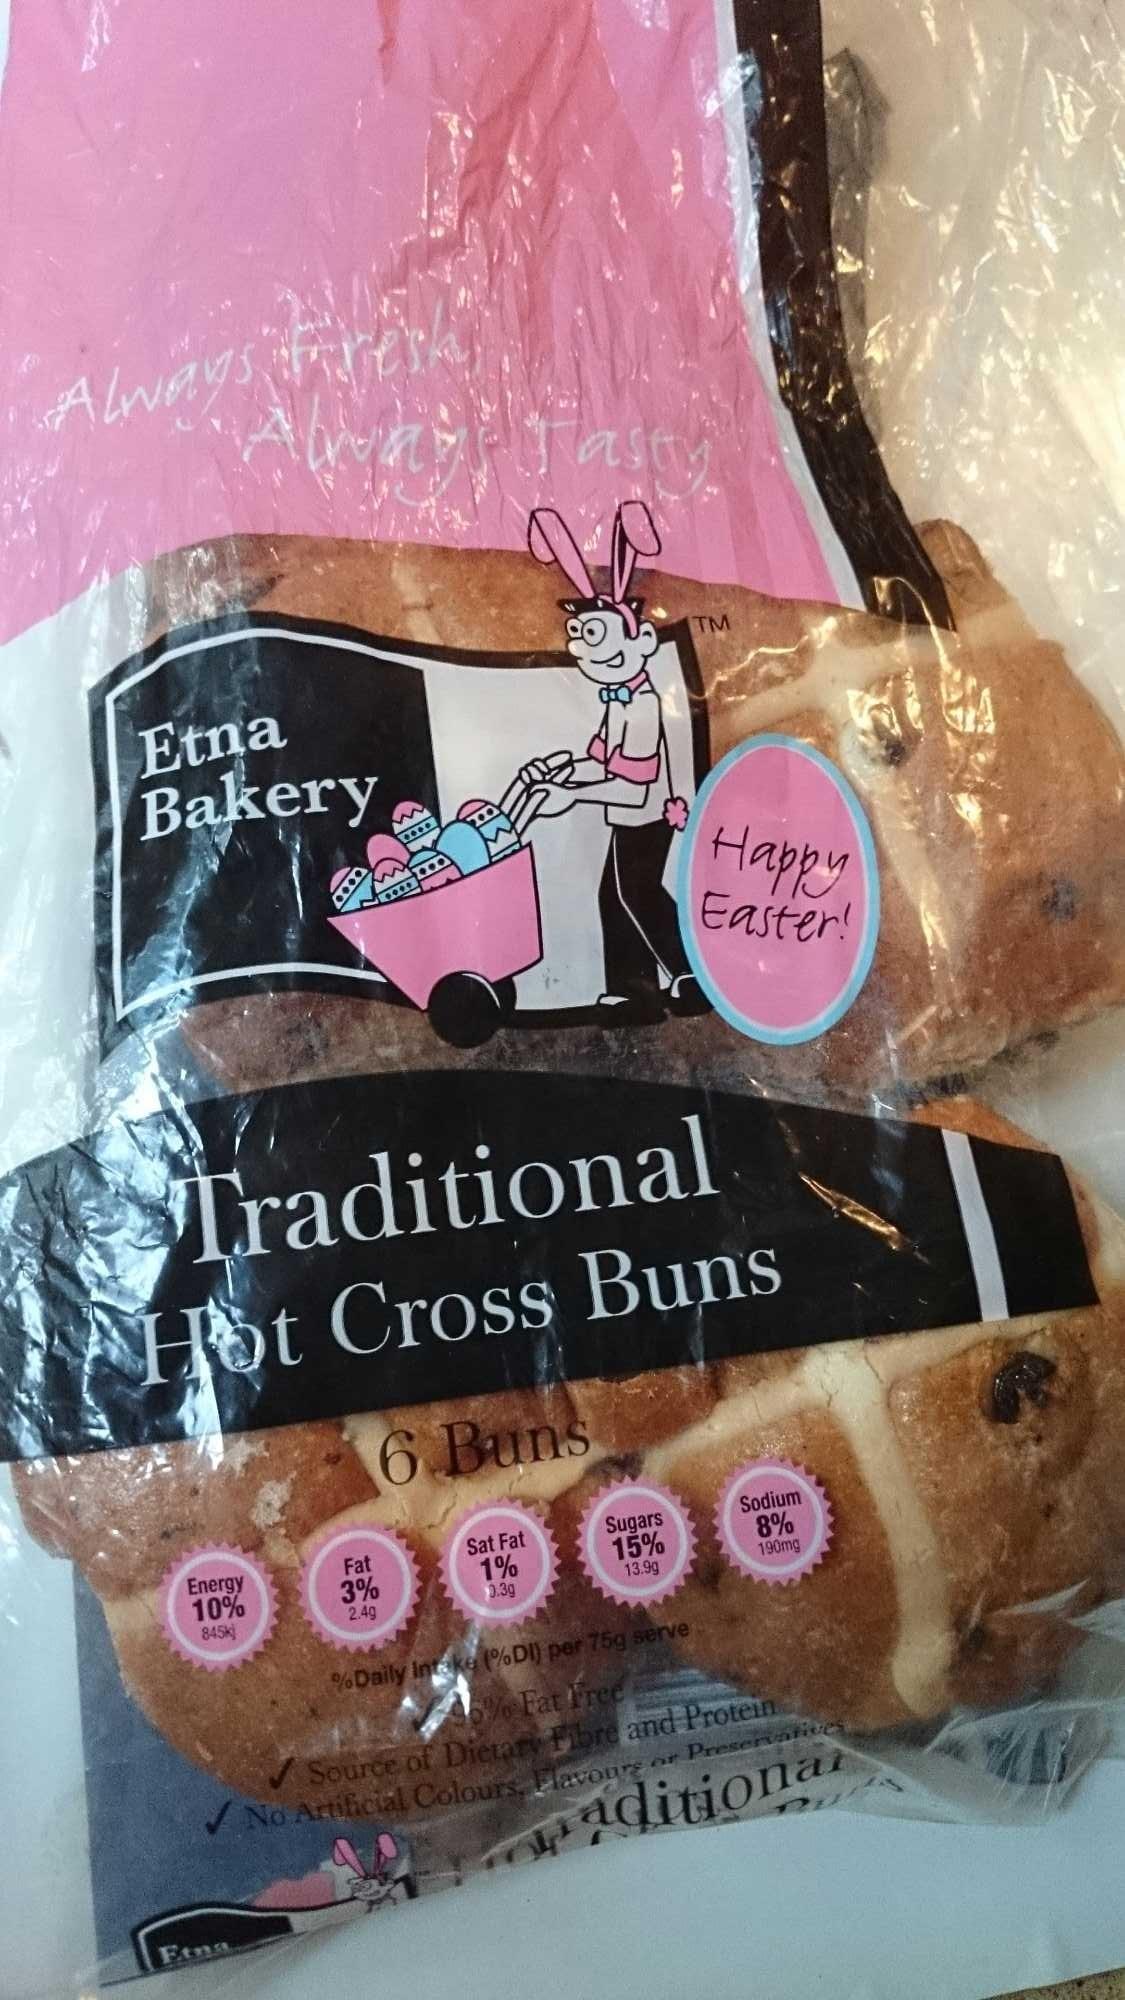 Traditional Hot Cross Buns - Produit